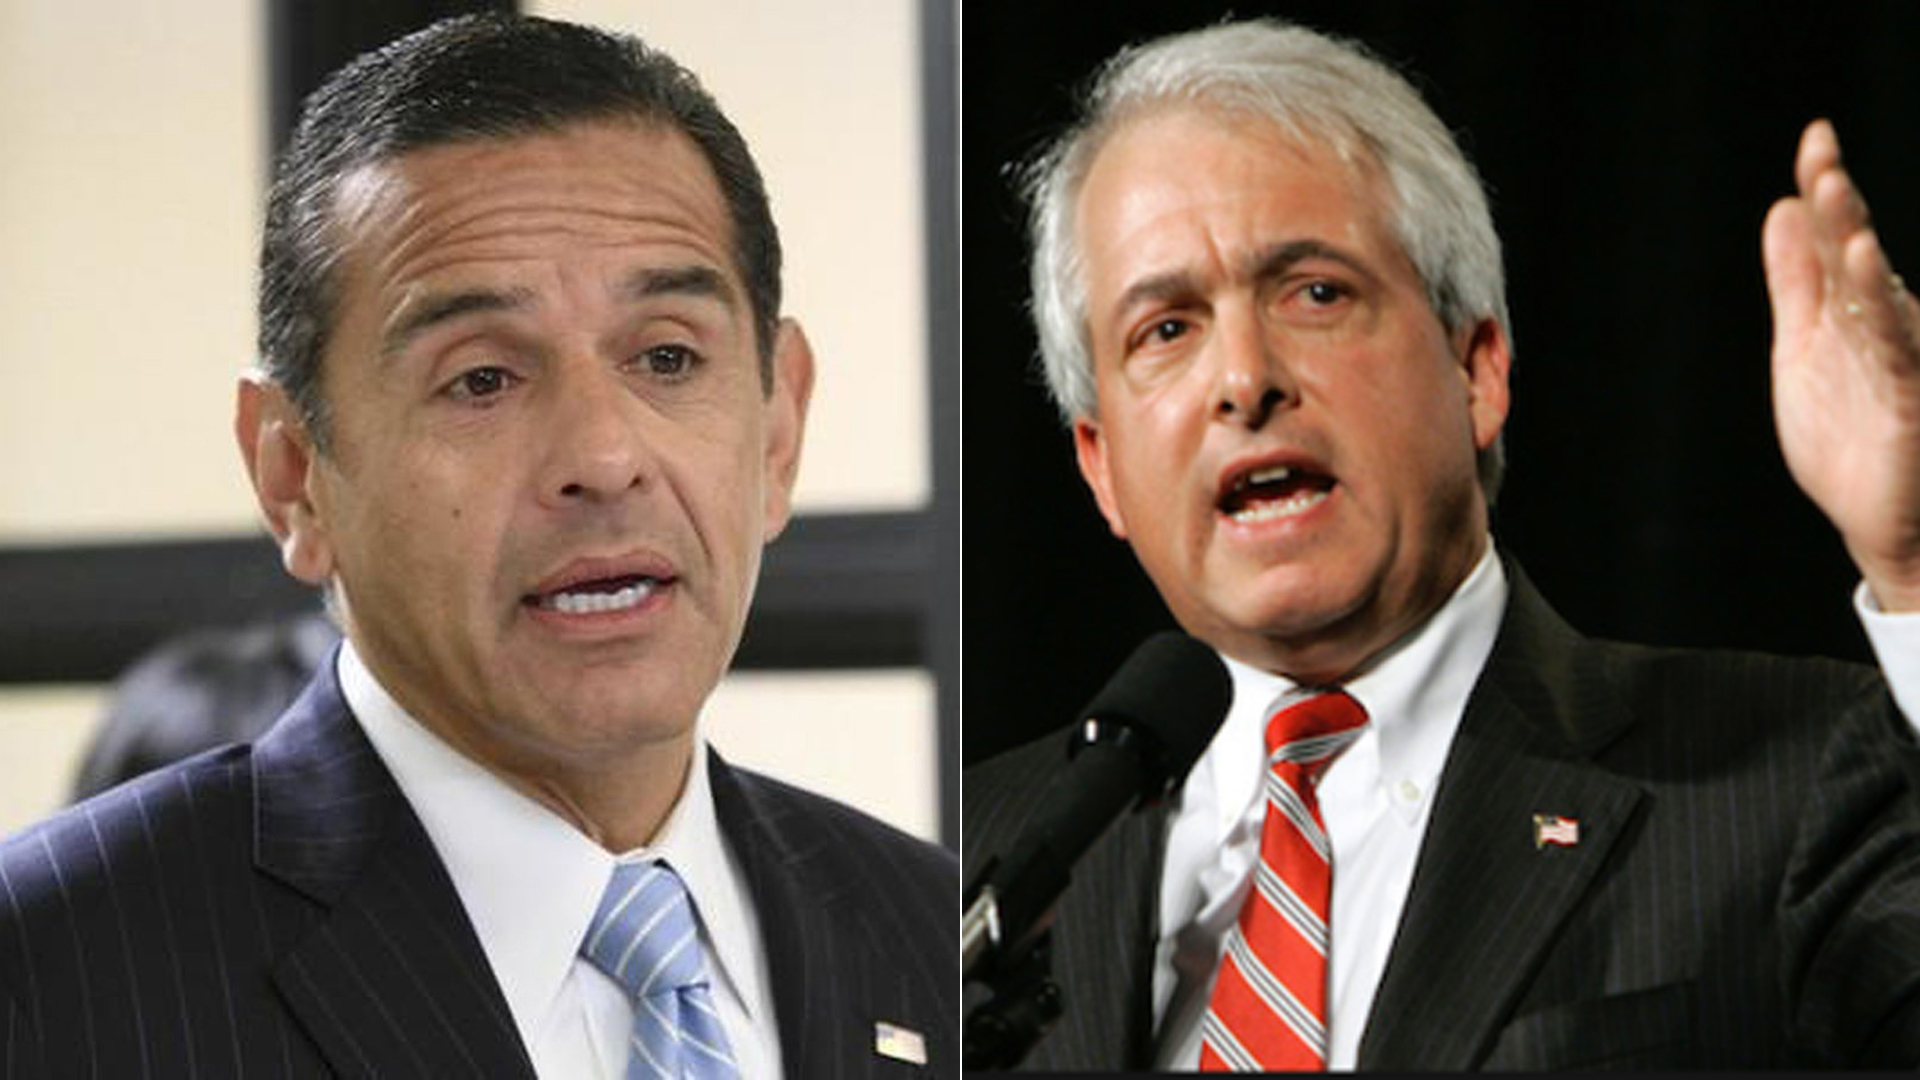 Democrat Antonio Villaraigosa, left, and Republican John Cox are both contenders in California's gubernatorial contest. (Credit: Irfan Khan / Los Angeles Times / John Cox's Facebook page)